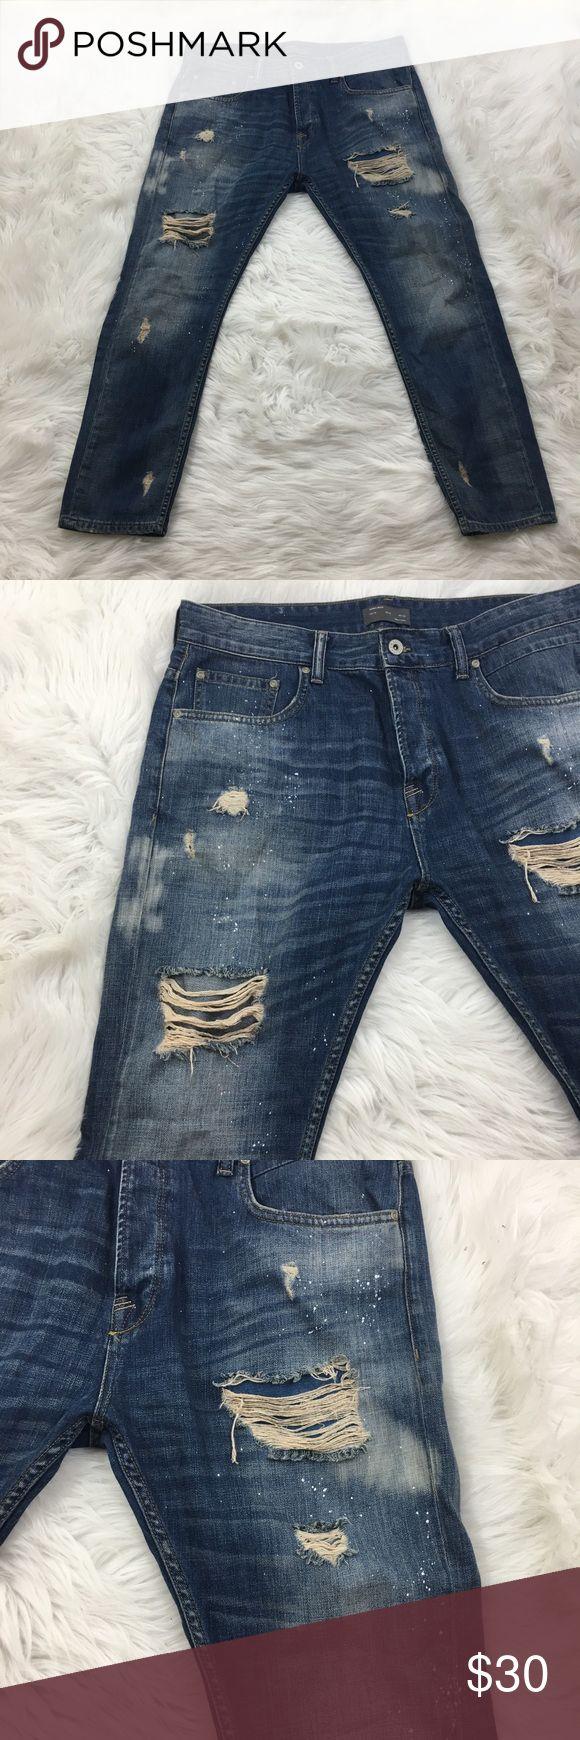 Mens jeans design legends jeans - Zara Man Jeans 36 X 28